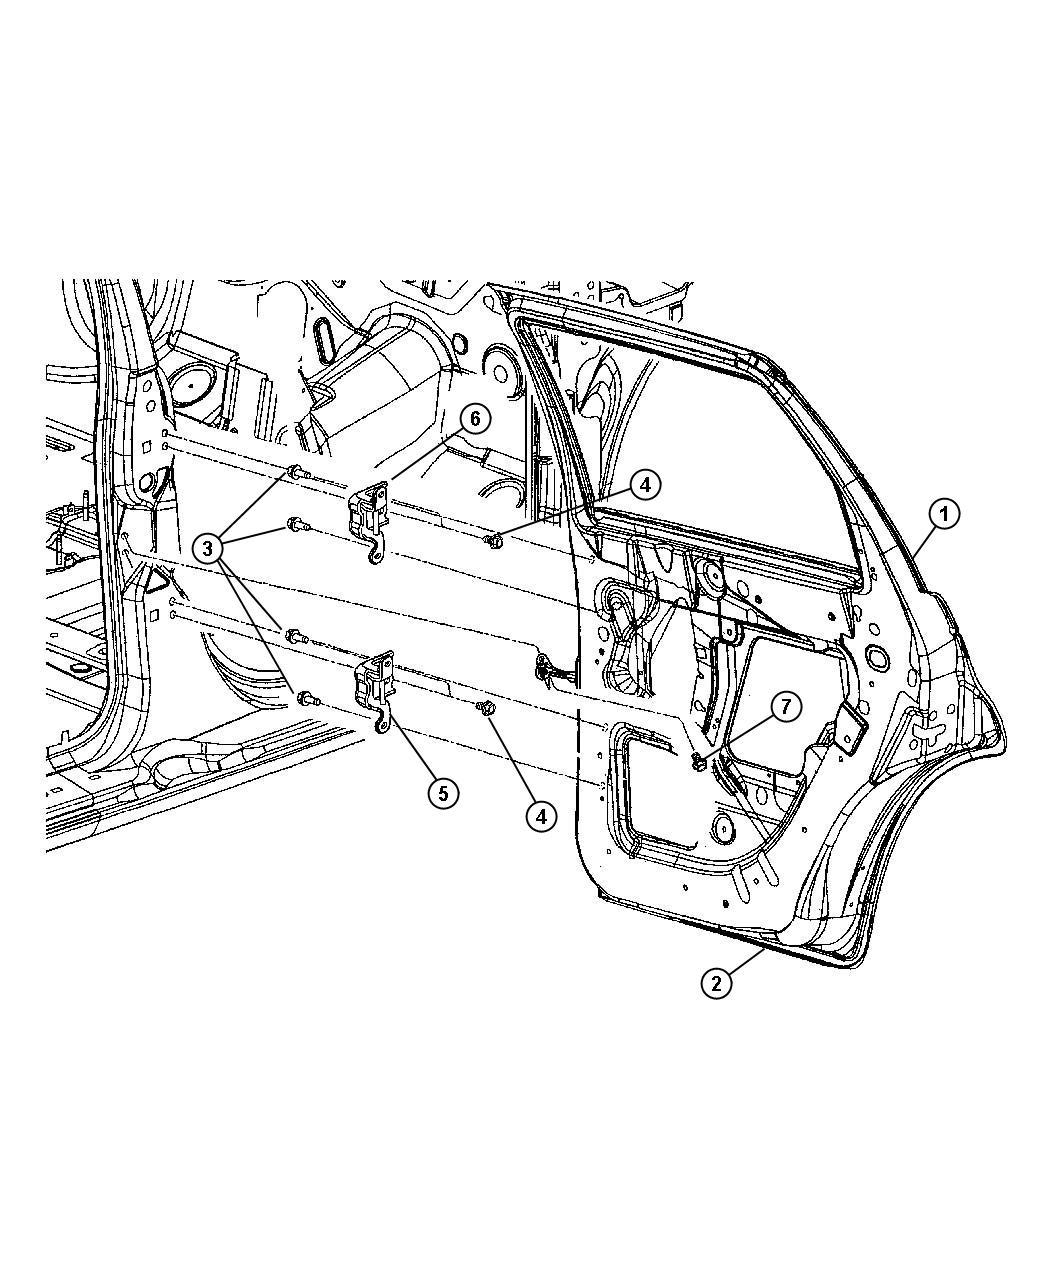 Chrysler Pt Cruiser Door Rear Left Door Assembly